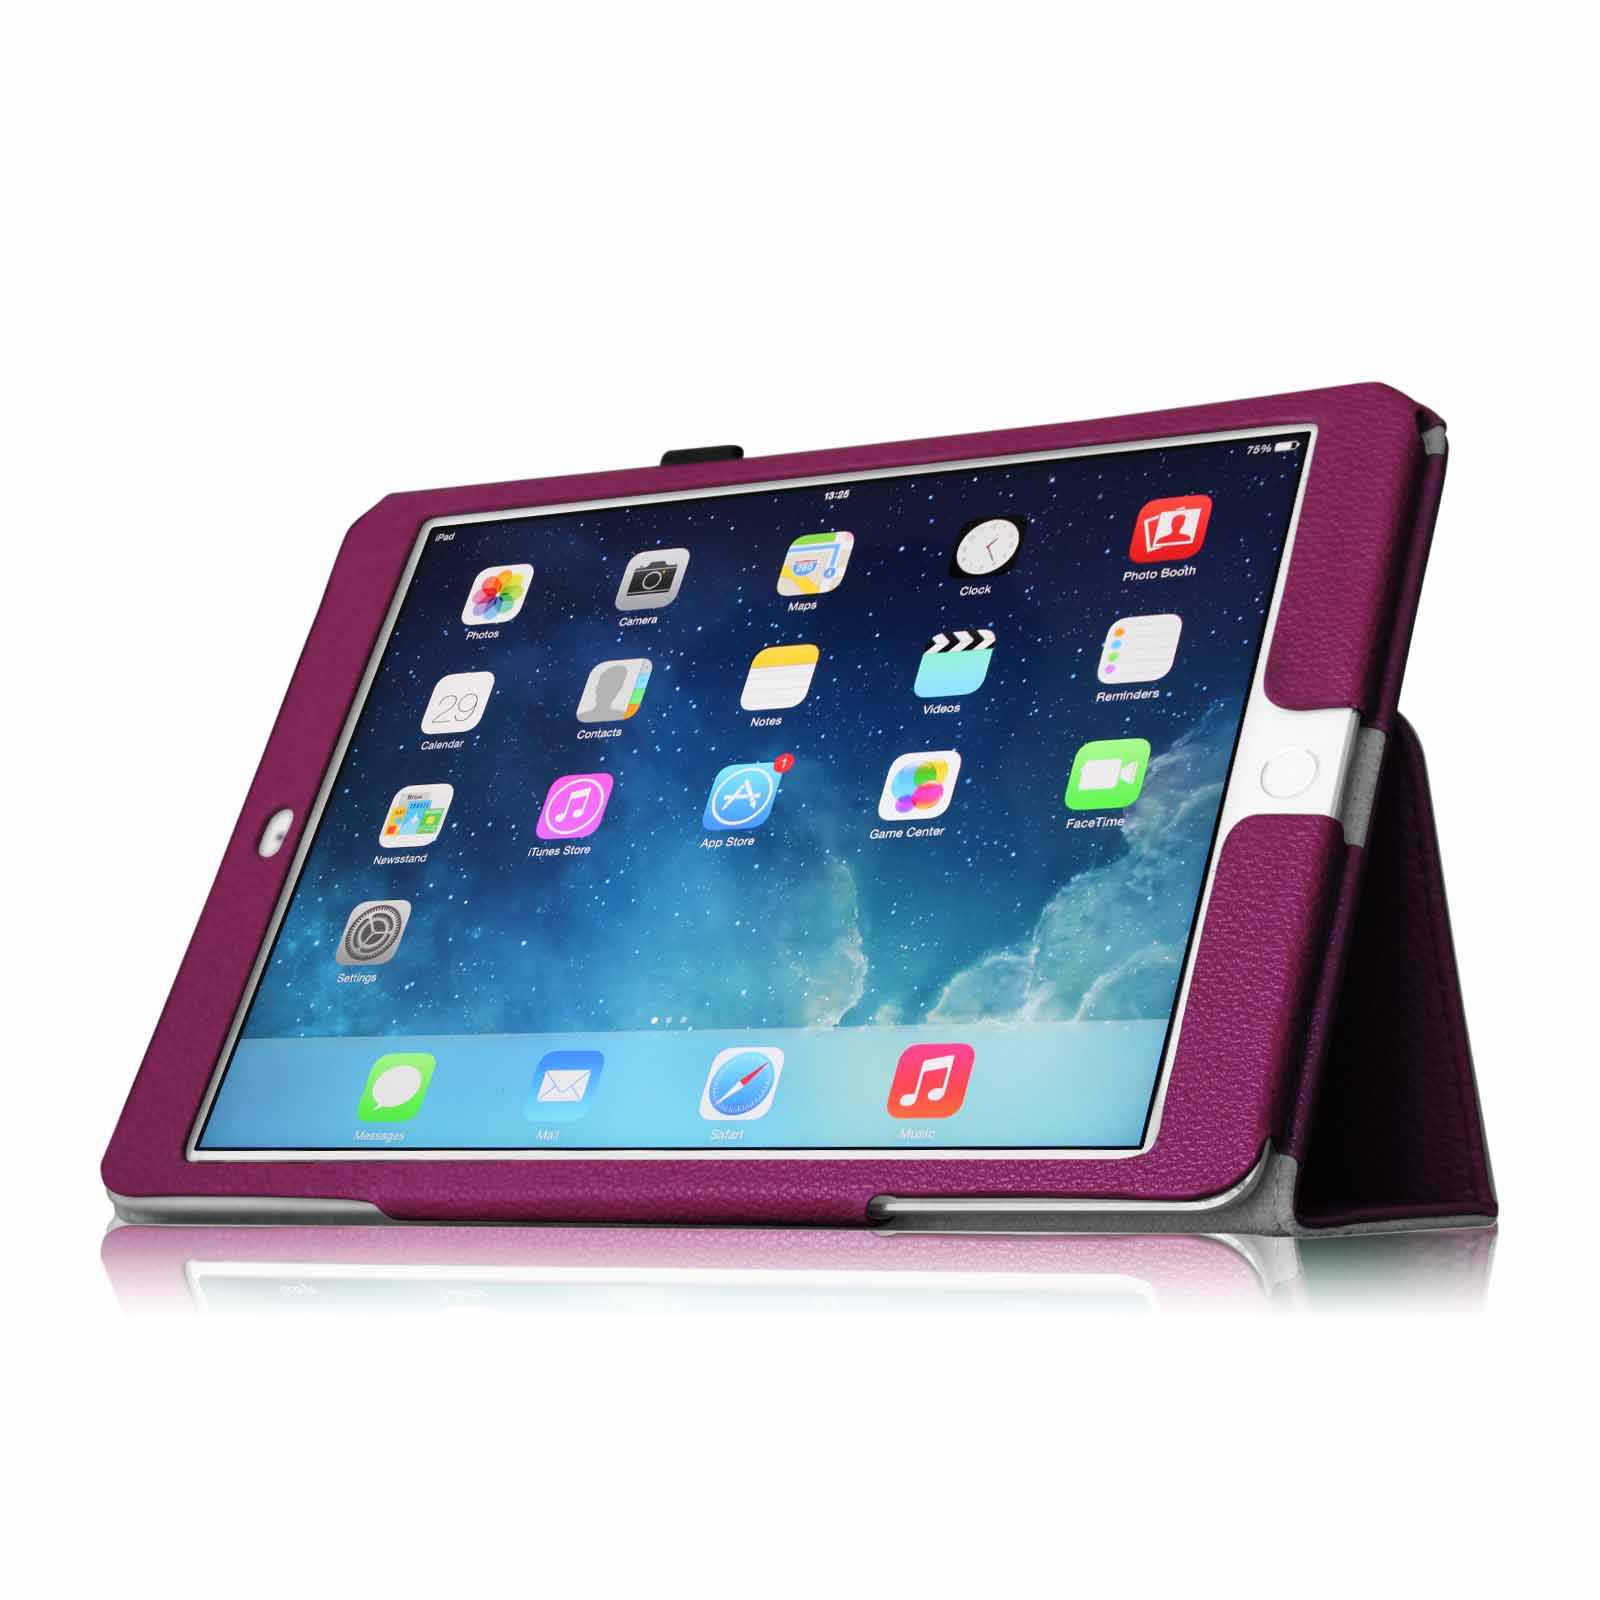 apple ipad 1st gen original generation ipad 2 3 4 ipad air. Black Bedroom Furniture Sets. Home Design Ideas